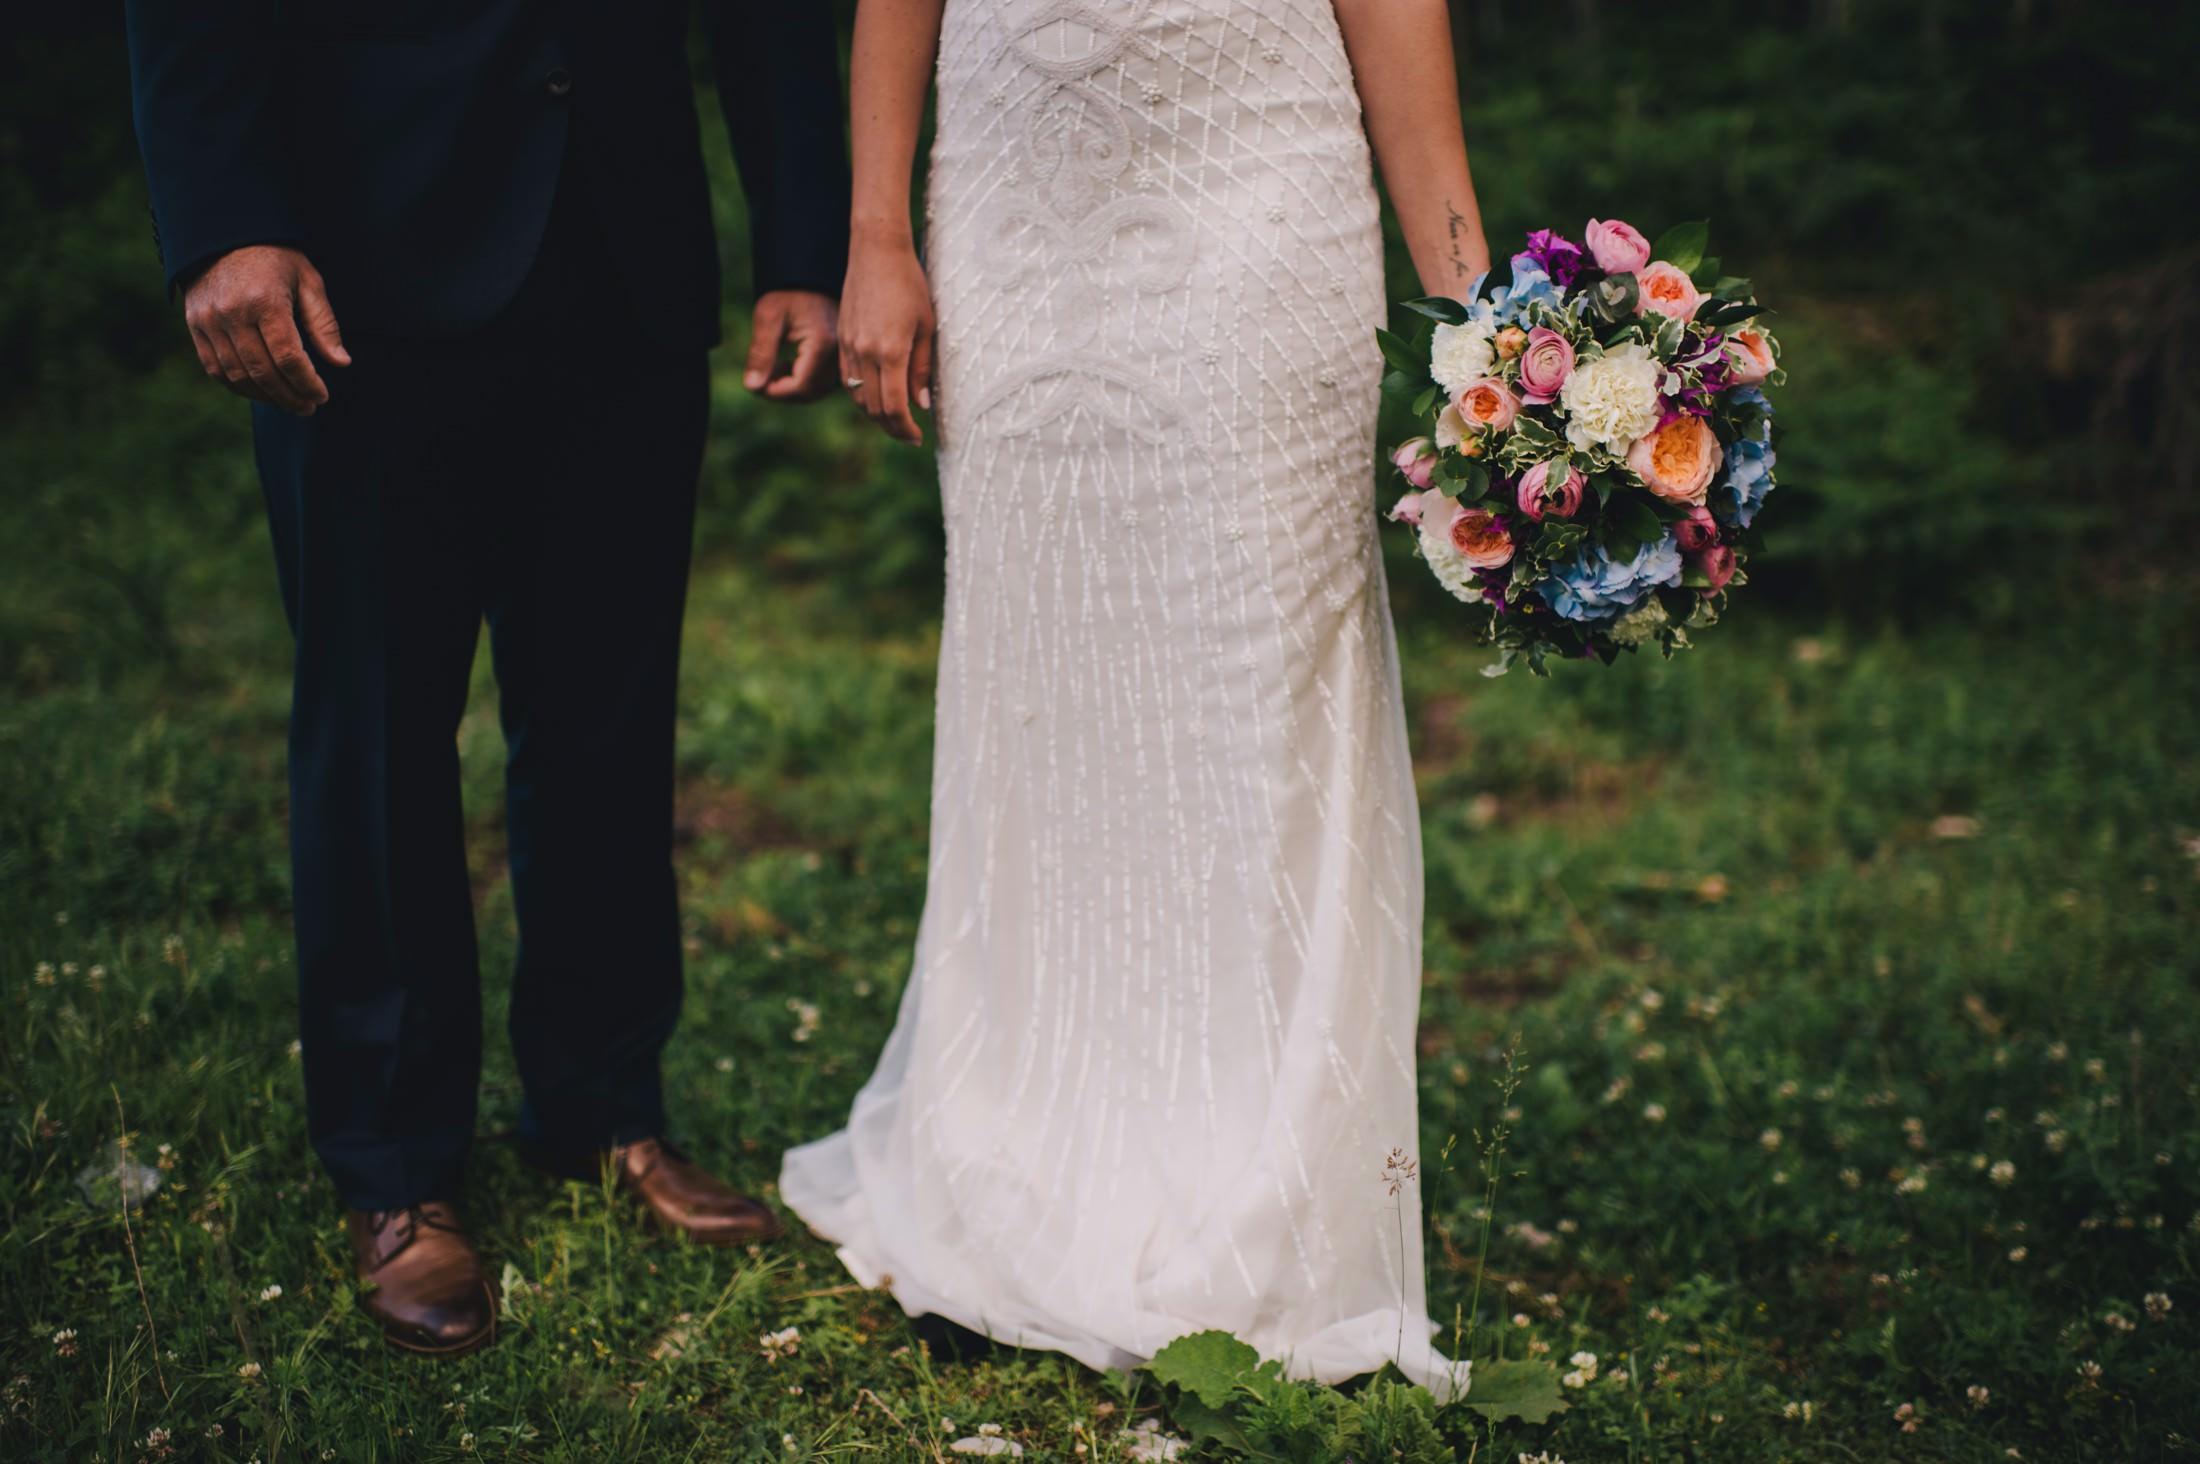 gianni di natale wedding bouquet detail